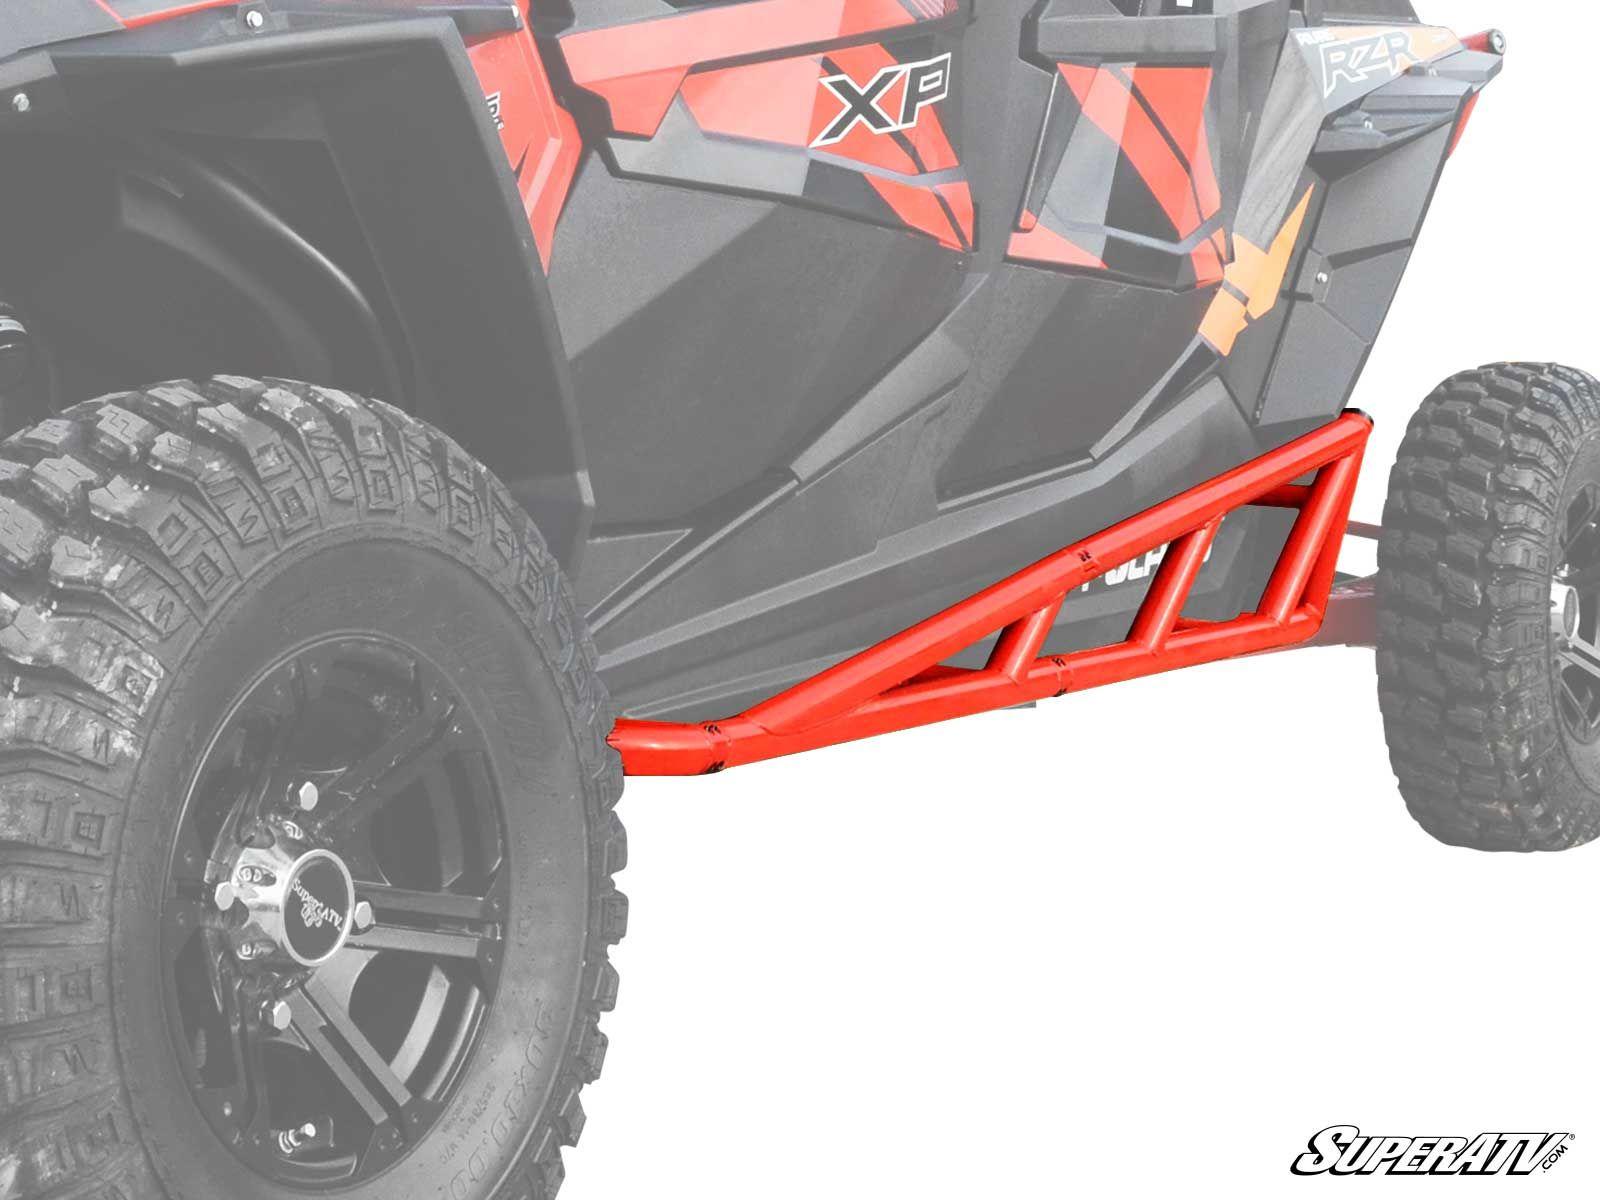 Super Atv Nerf Bars For The Polaris Rzr Xp 4 1000 Rzr 4 900 Xp 4 Turbo